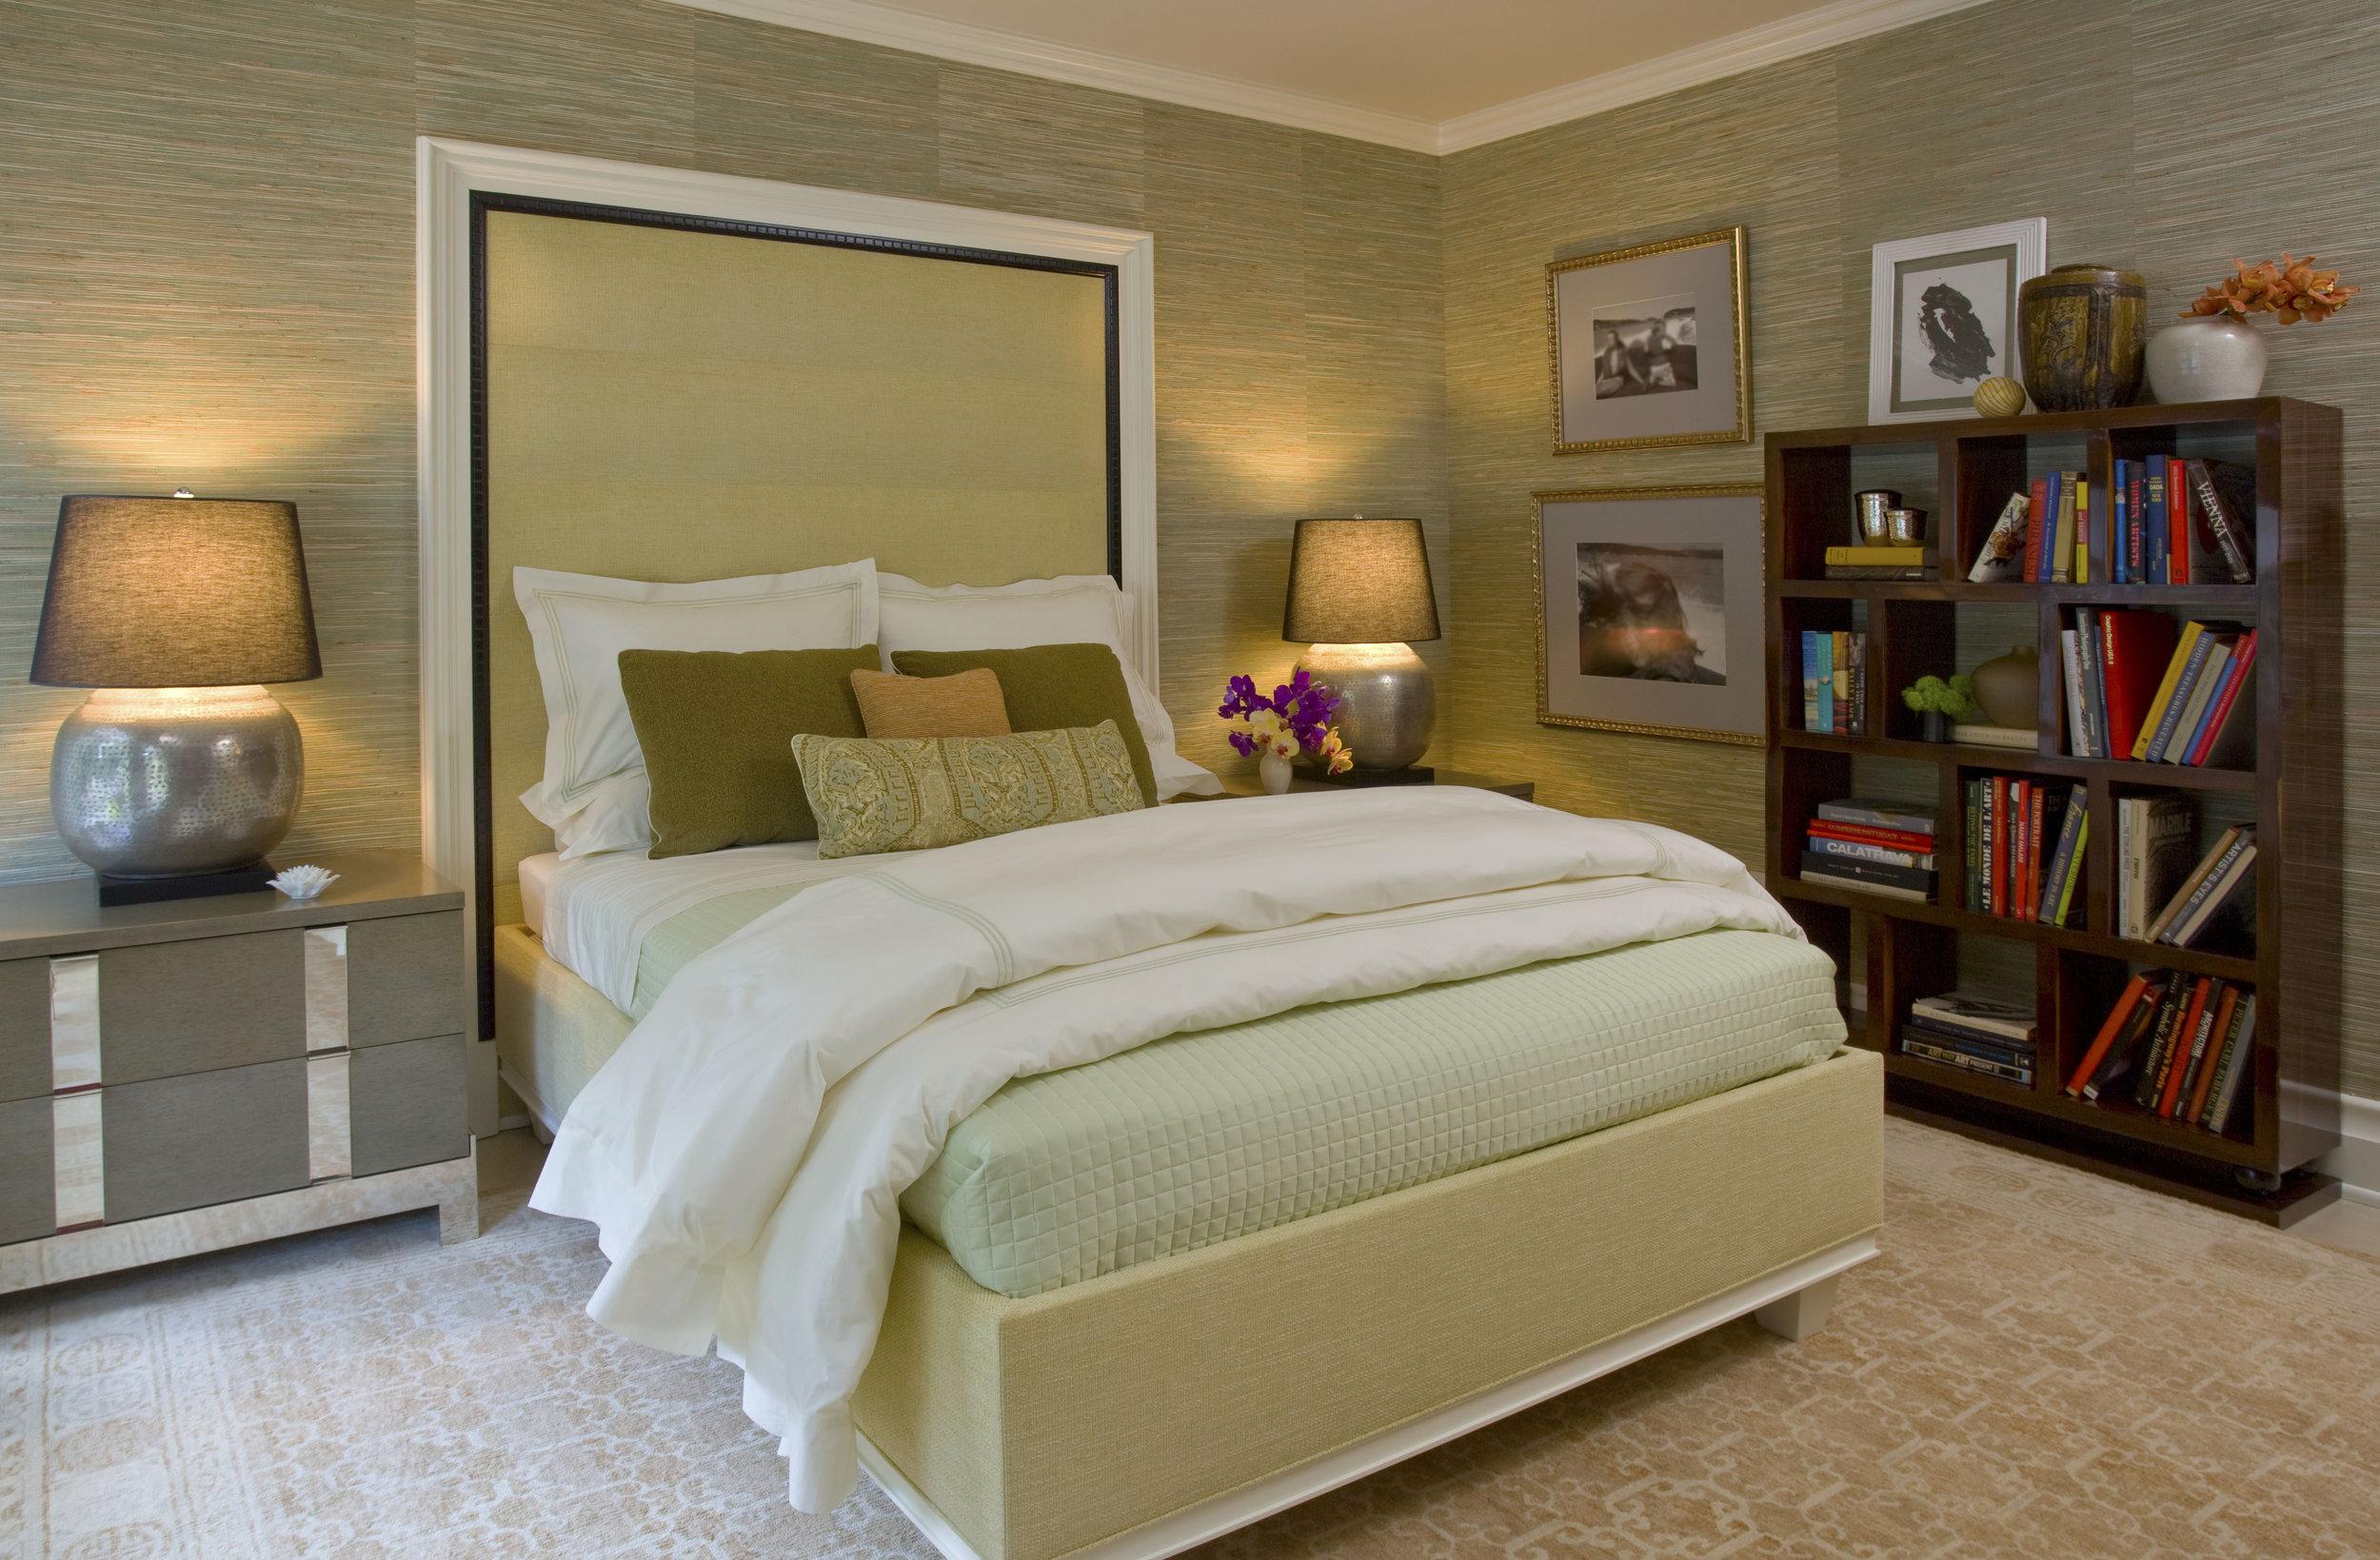 15 - CPW-21 Bedroom 3.jpg